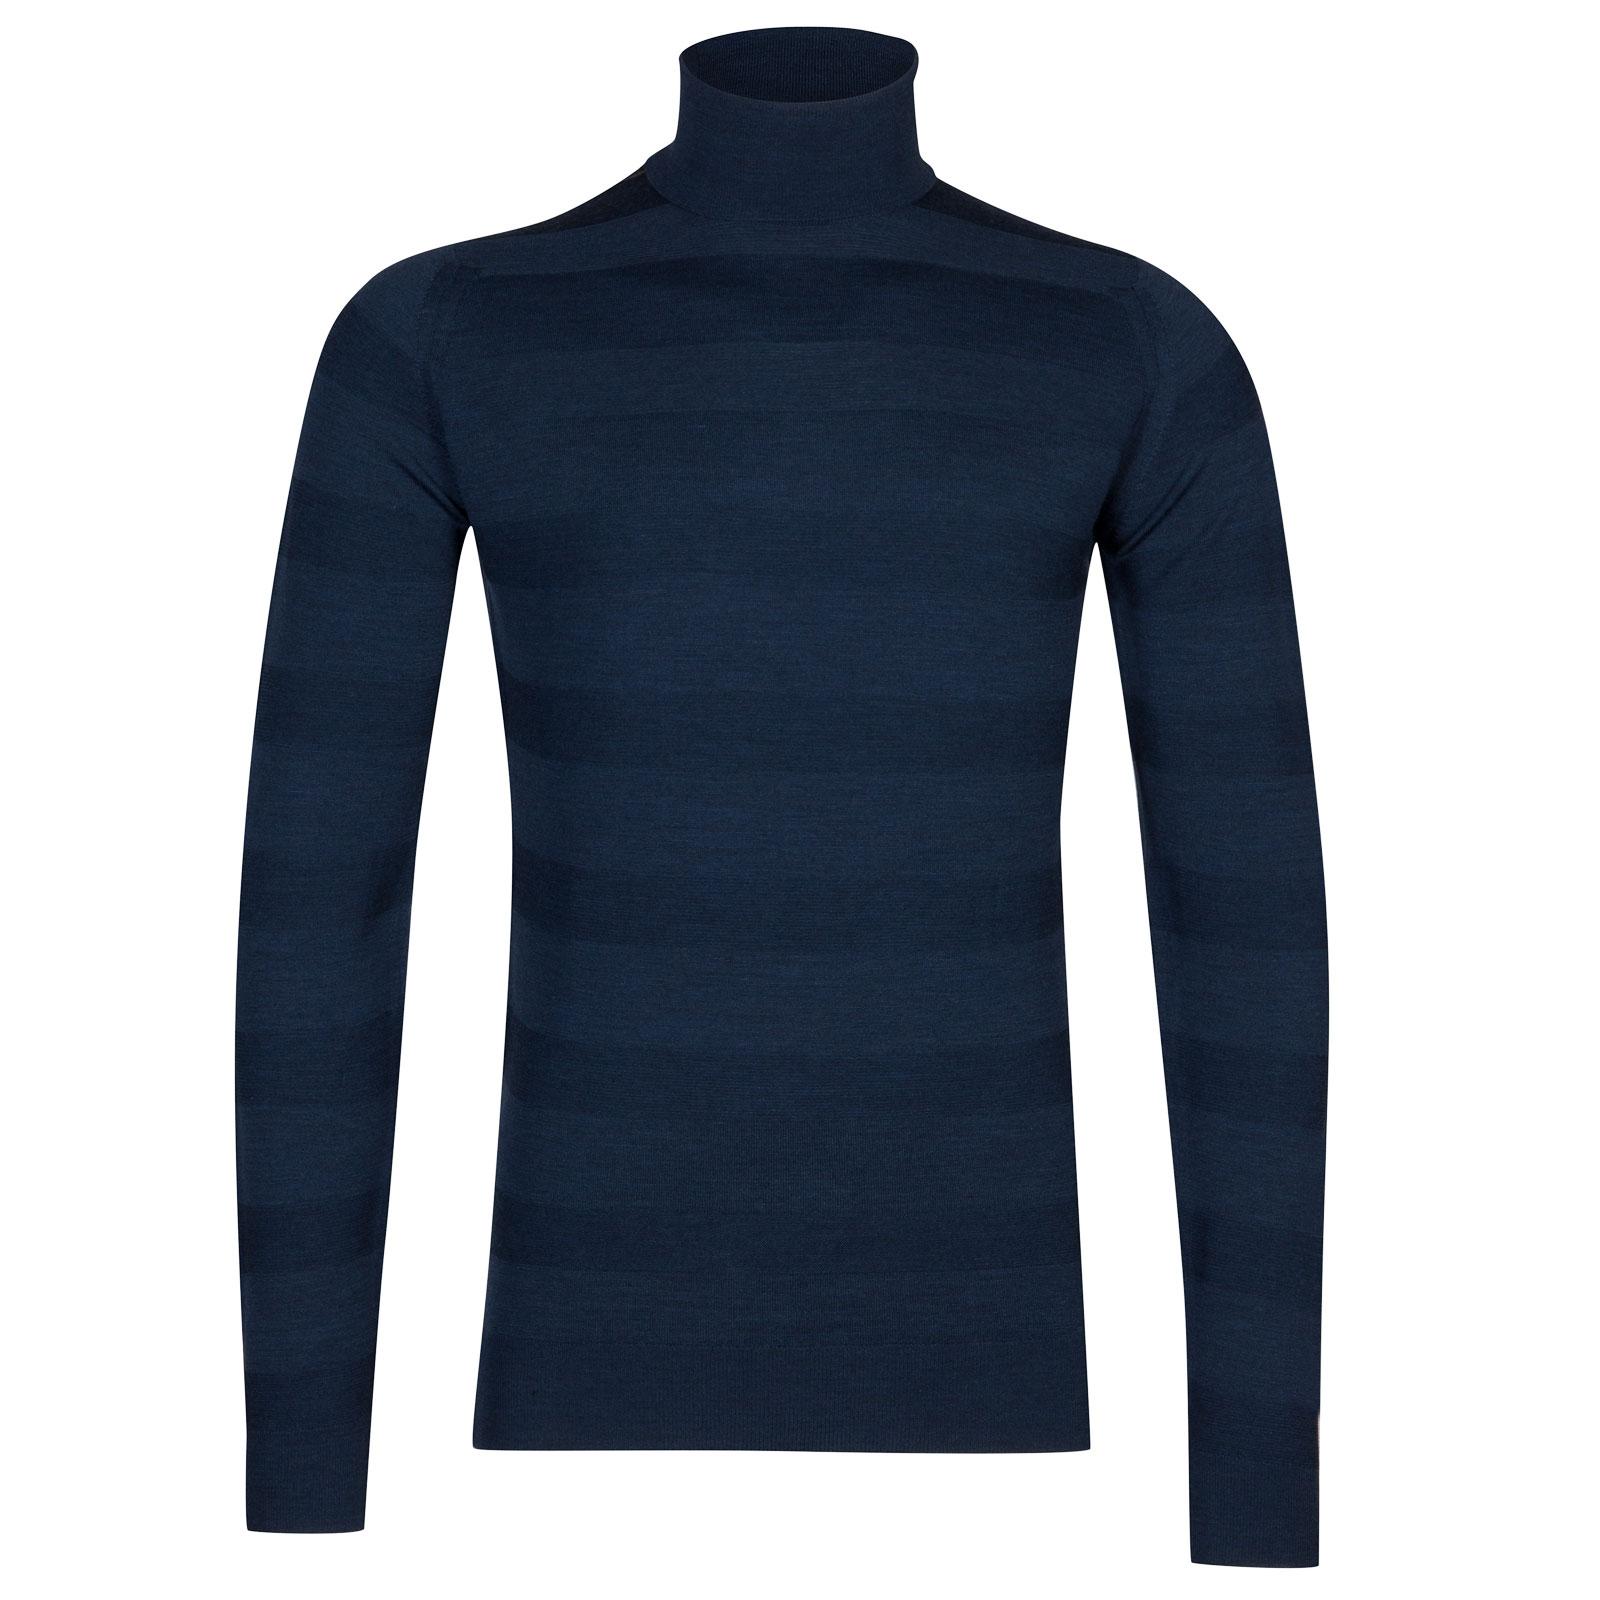 John Smedley ripley Merino Wool Pullover in Indigo-S